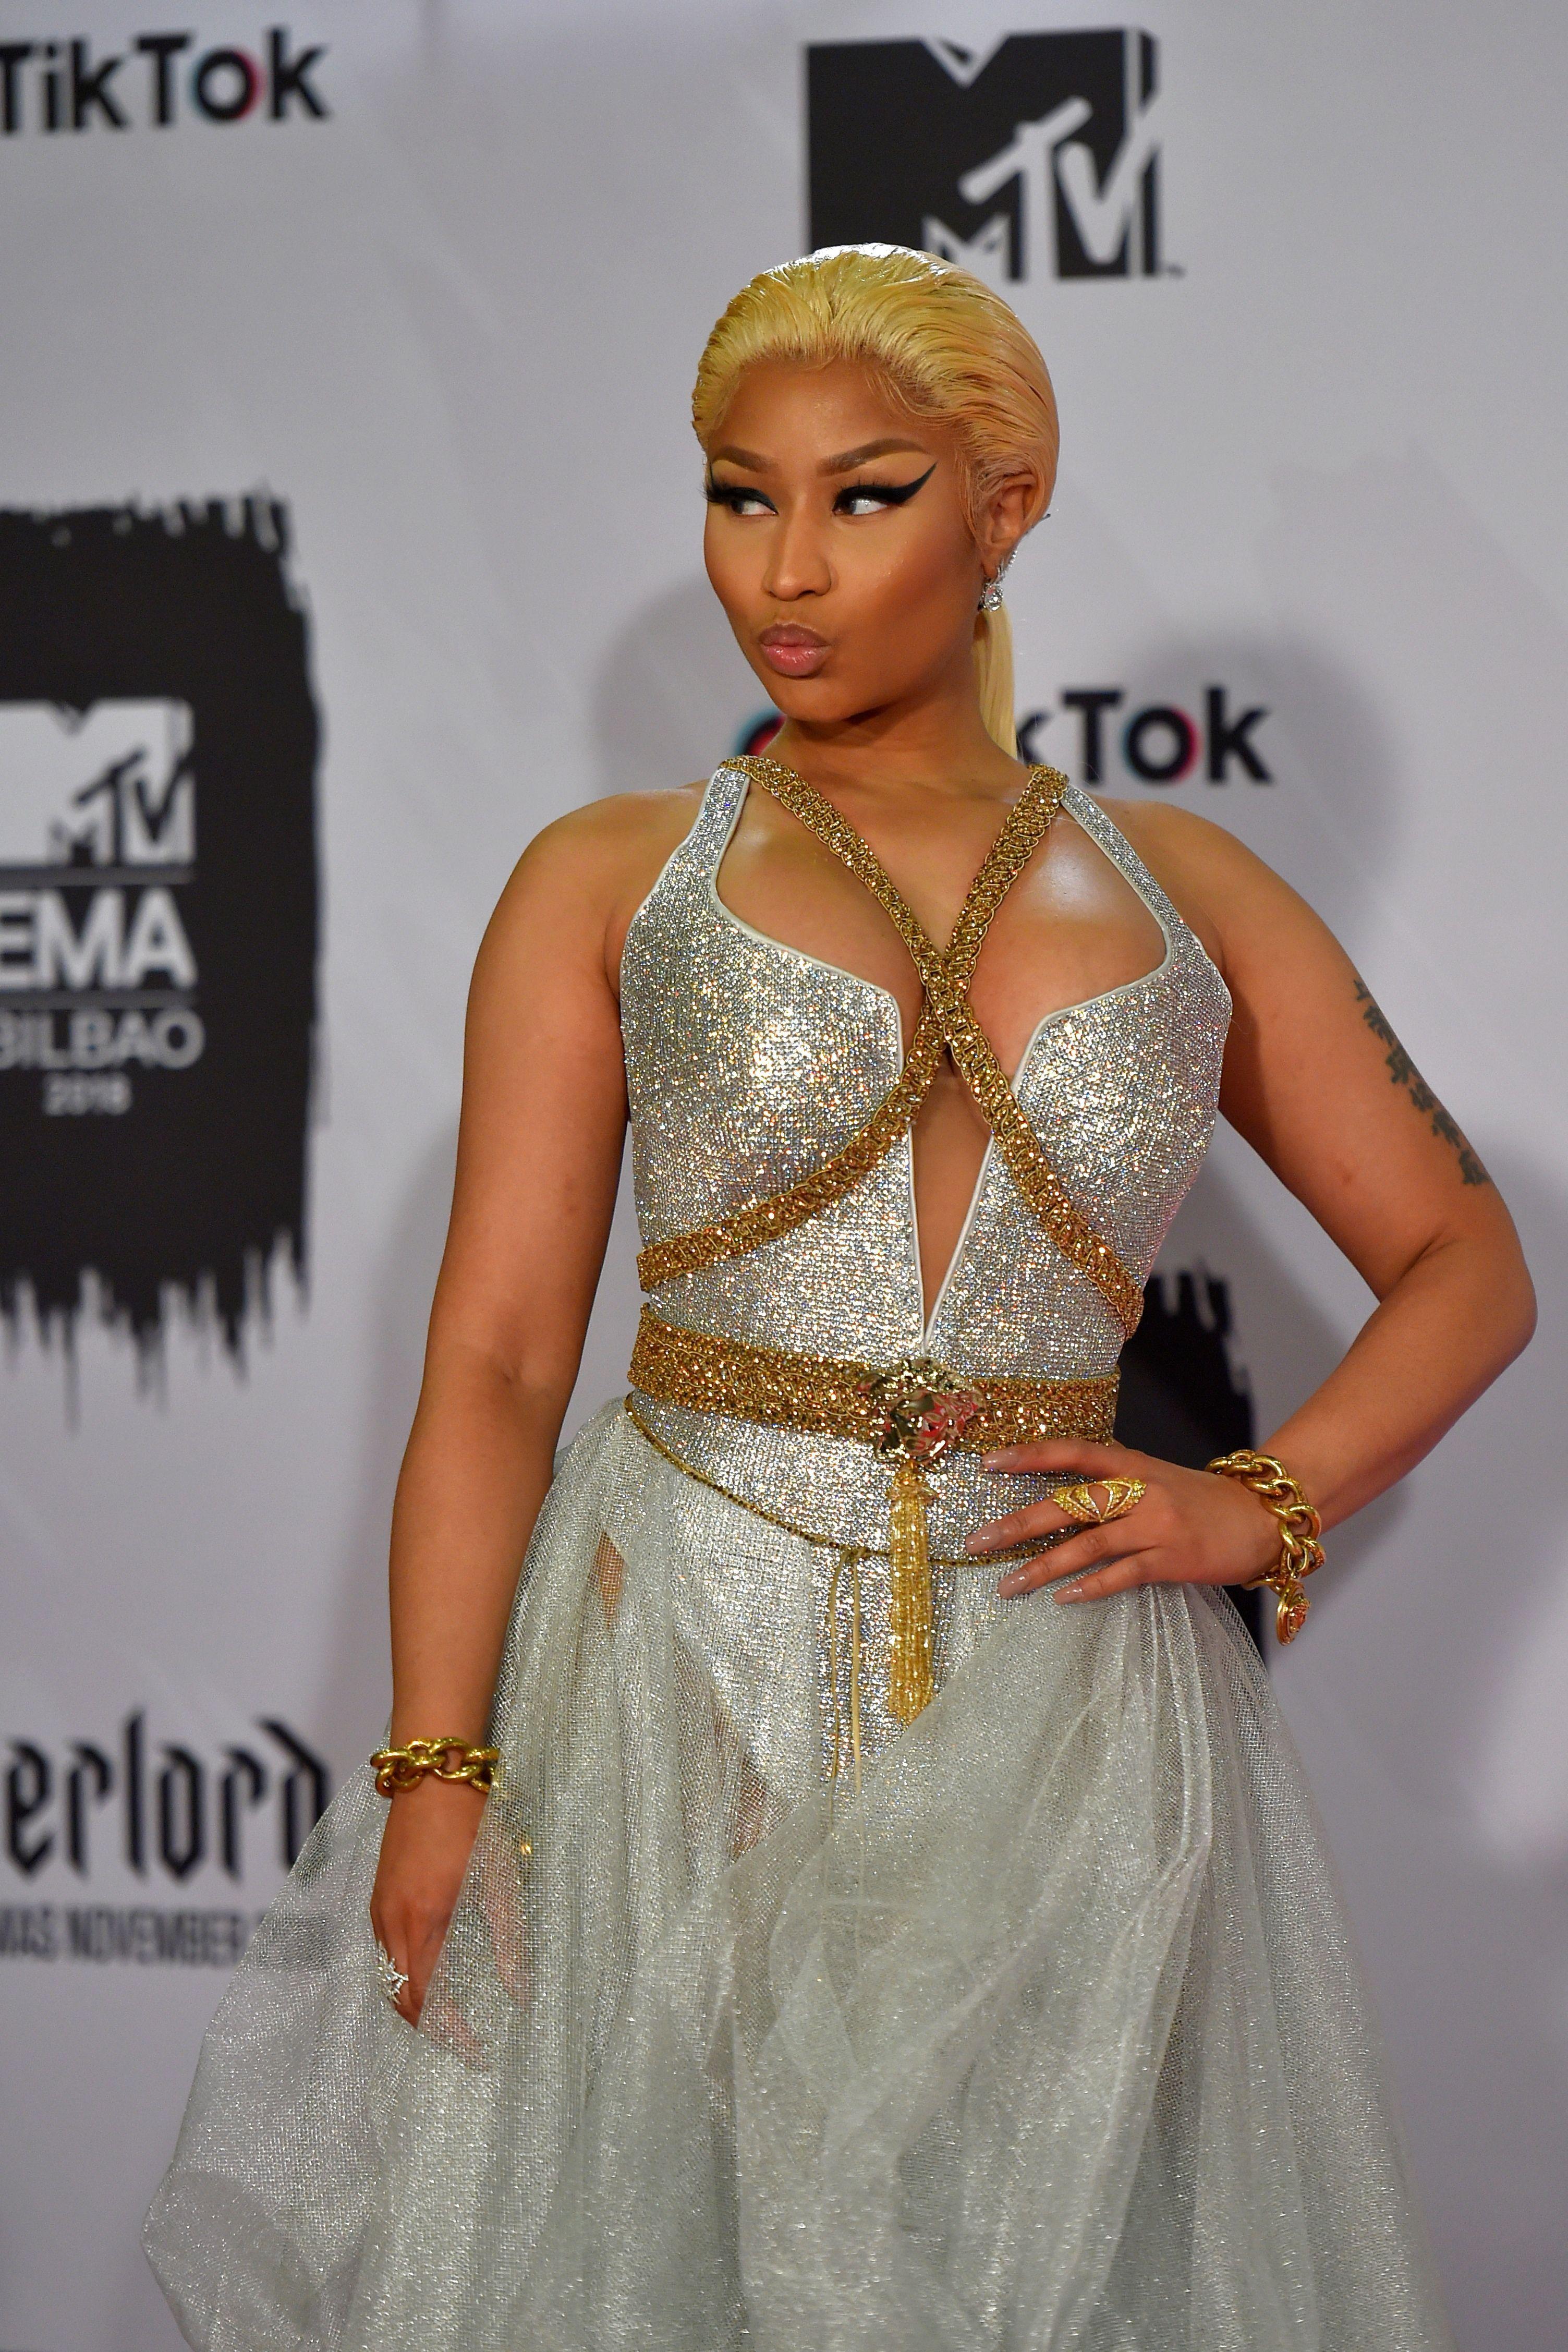 Twitter's pretty sure Nicki Minaj forgot her lyrics at the People's Choice Awards